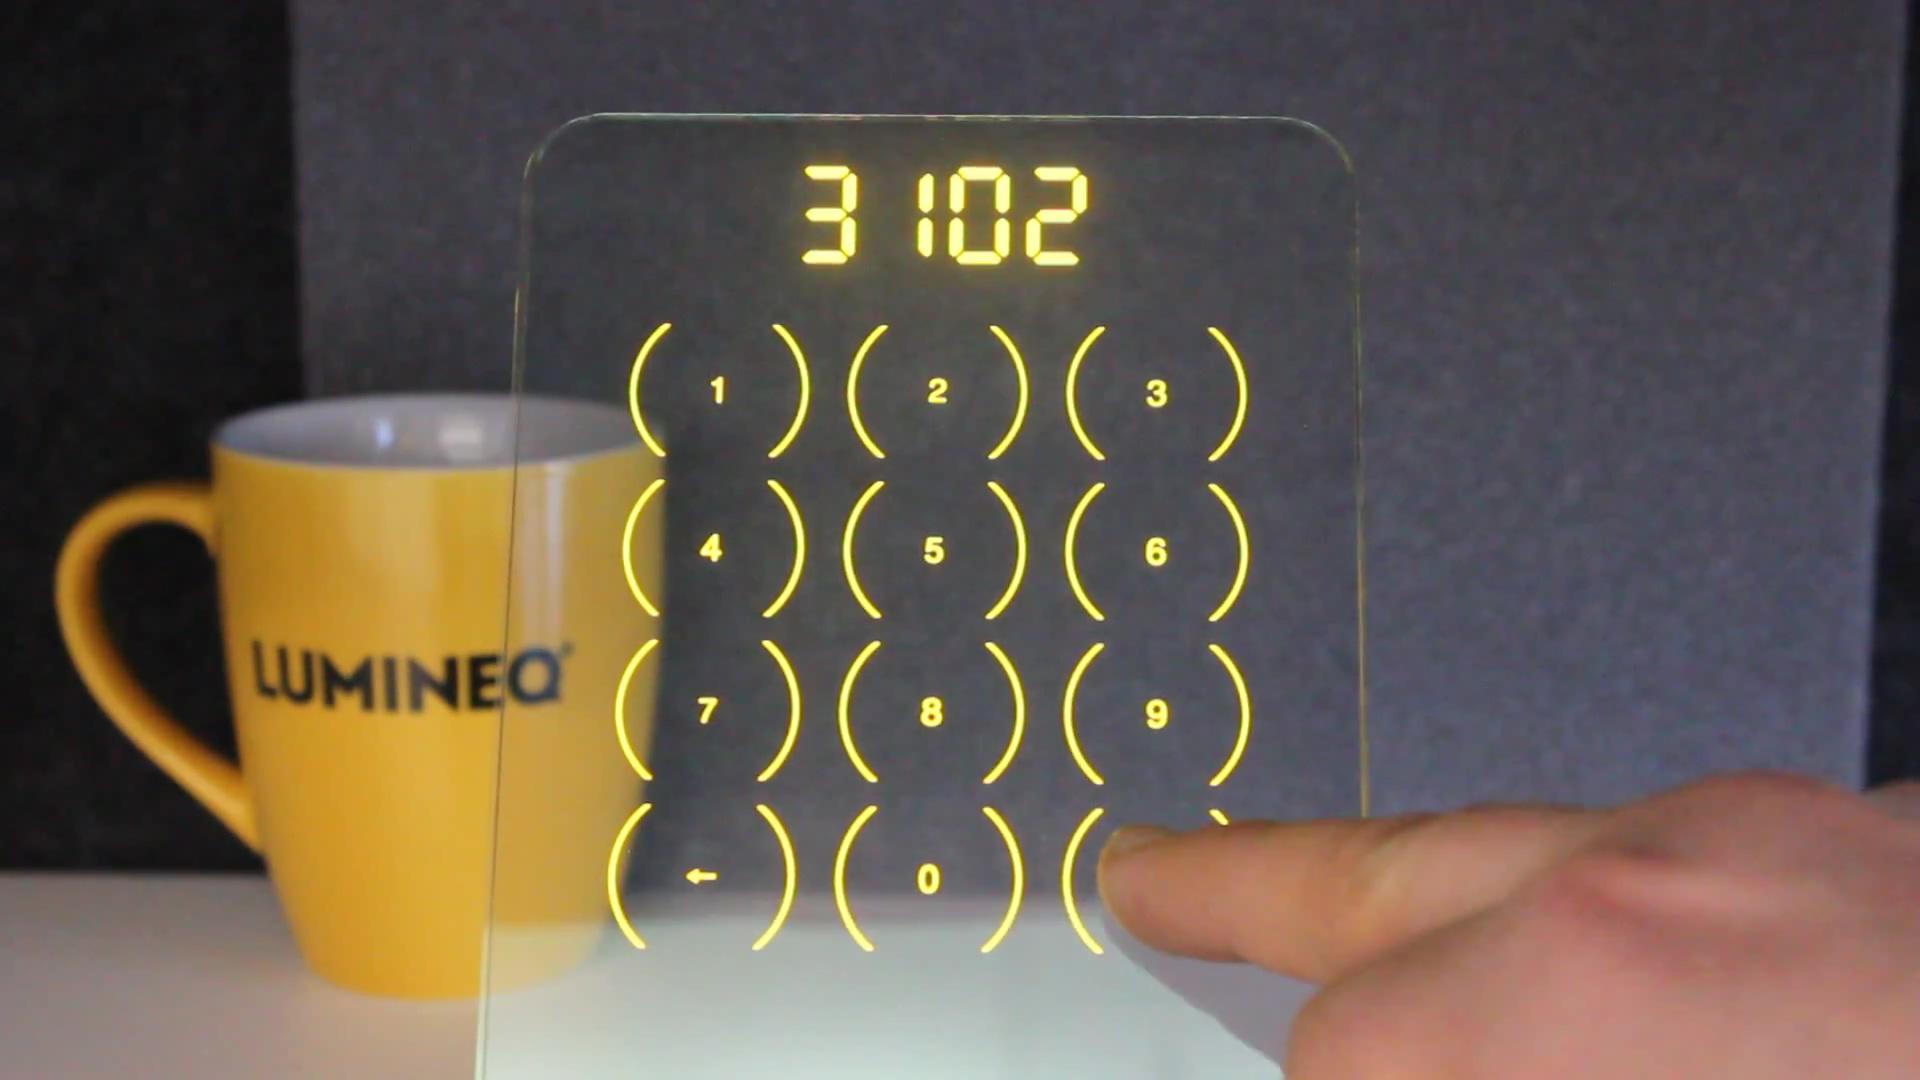 Keypad demo video